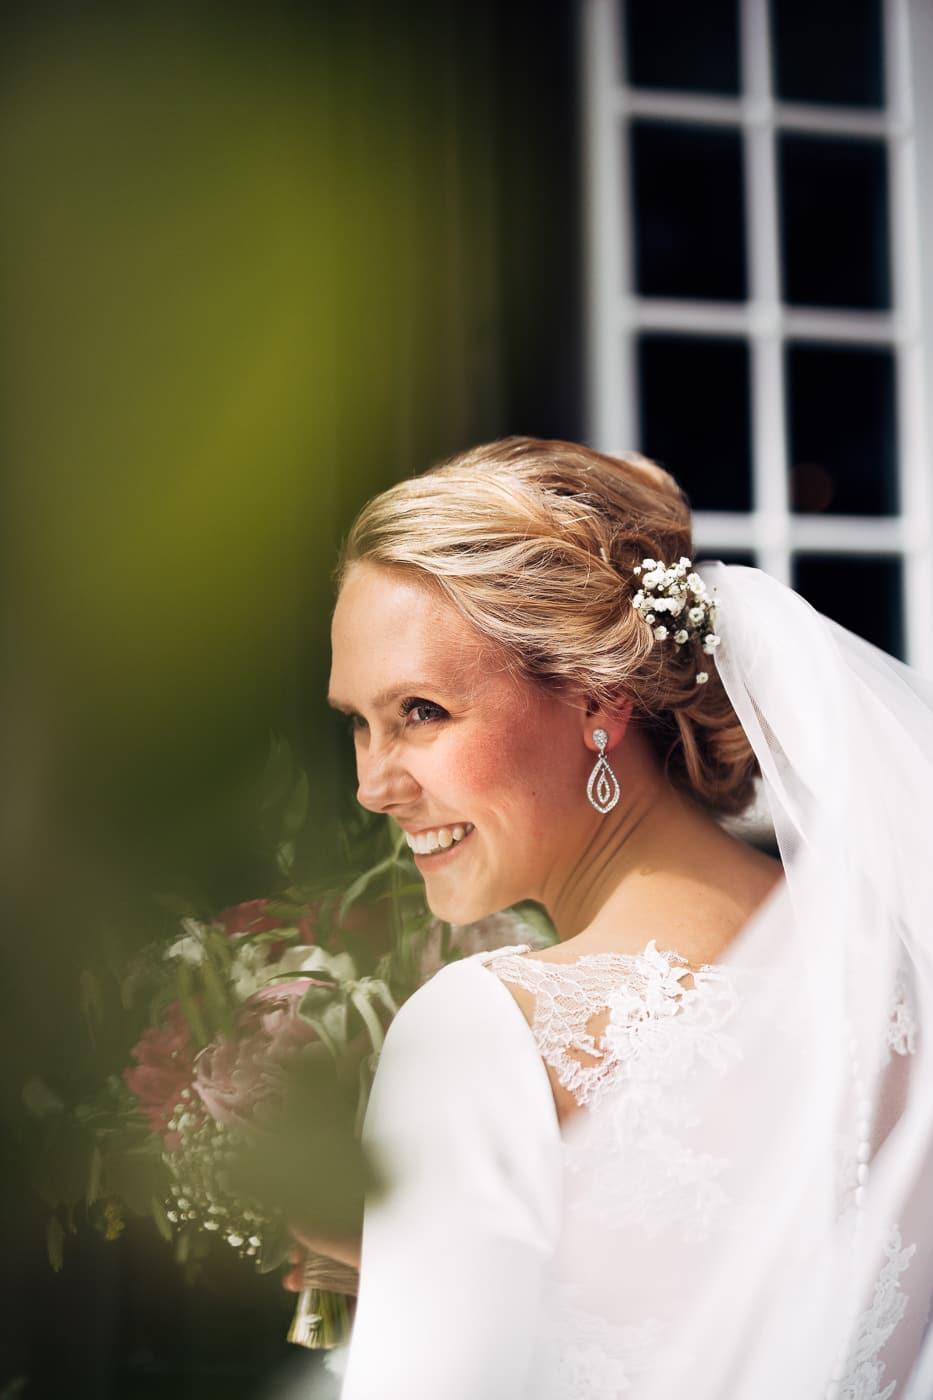 Karoline & Andreas - bryllup i Østfold med magiske detaljer Bryllup Fredrikstad Fotograf 38